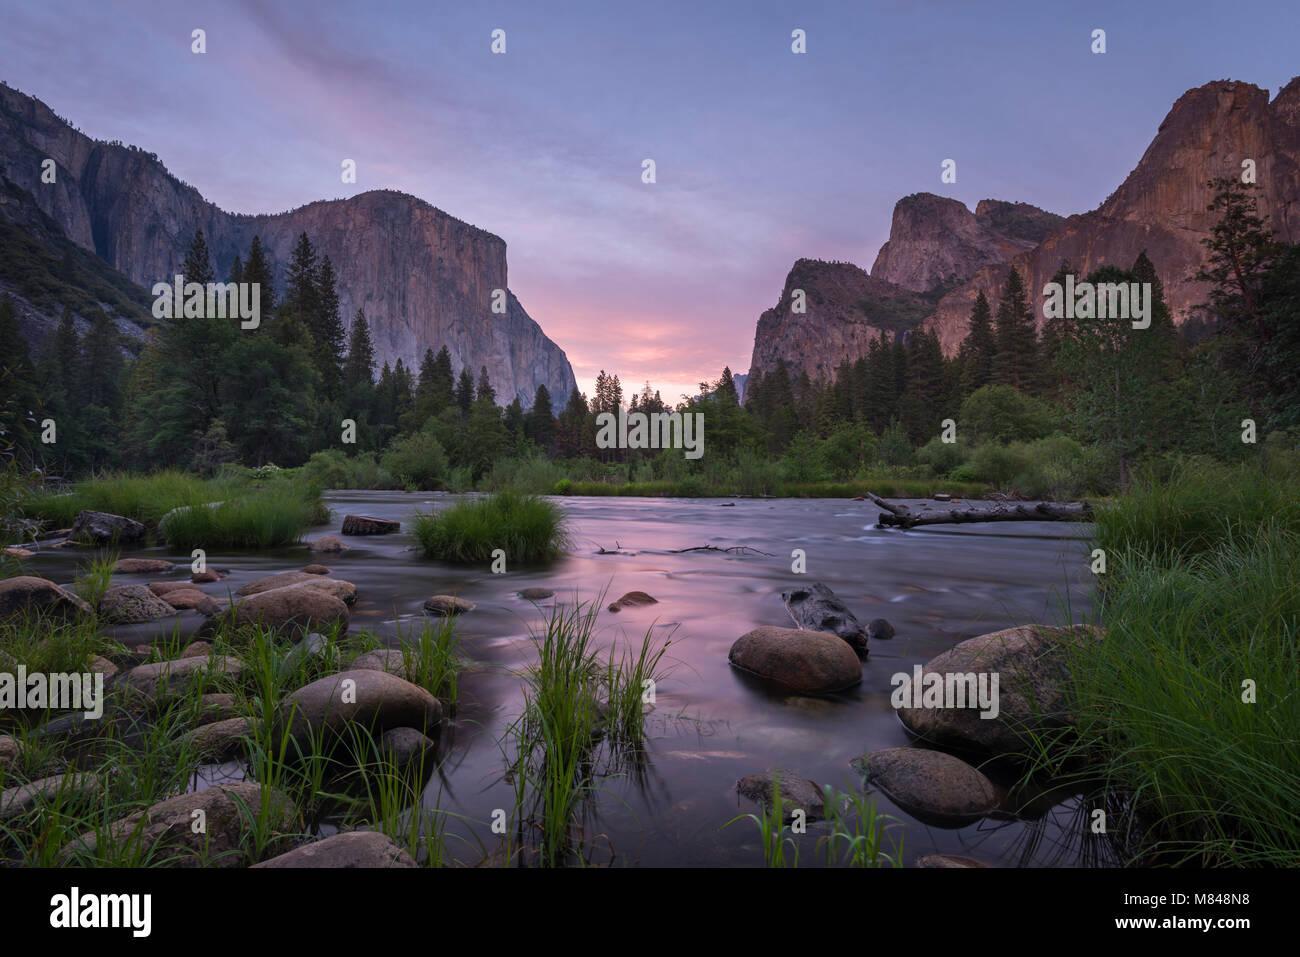 Yosemite Tal und den Fluss Merced bei Dämmerung, Yosemite National Park, Kalifornien, USA. Feder (Juni) 2015. Stockbild